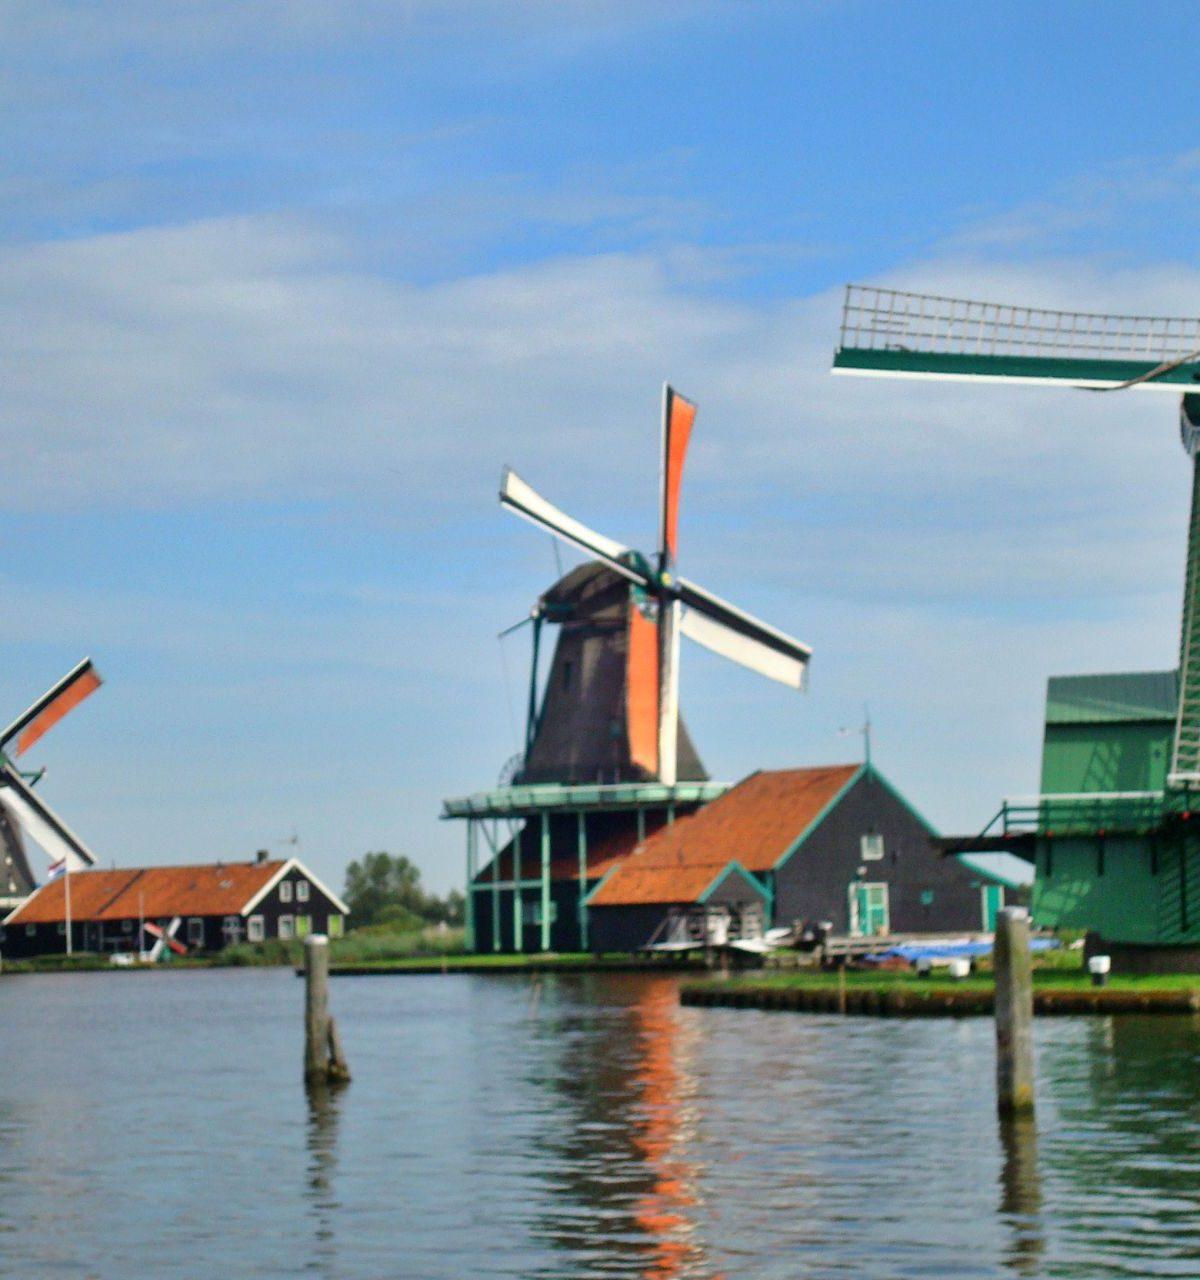 zaanse schans windmolen noord holland b&blanormande westwoud-04